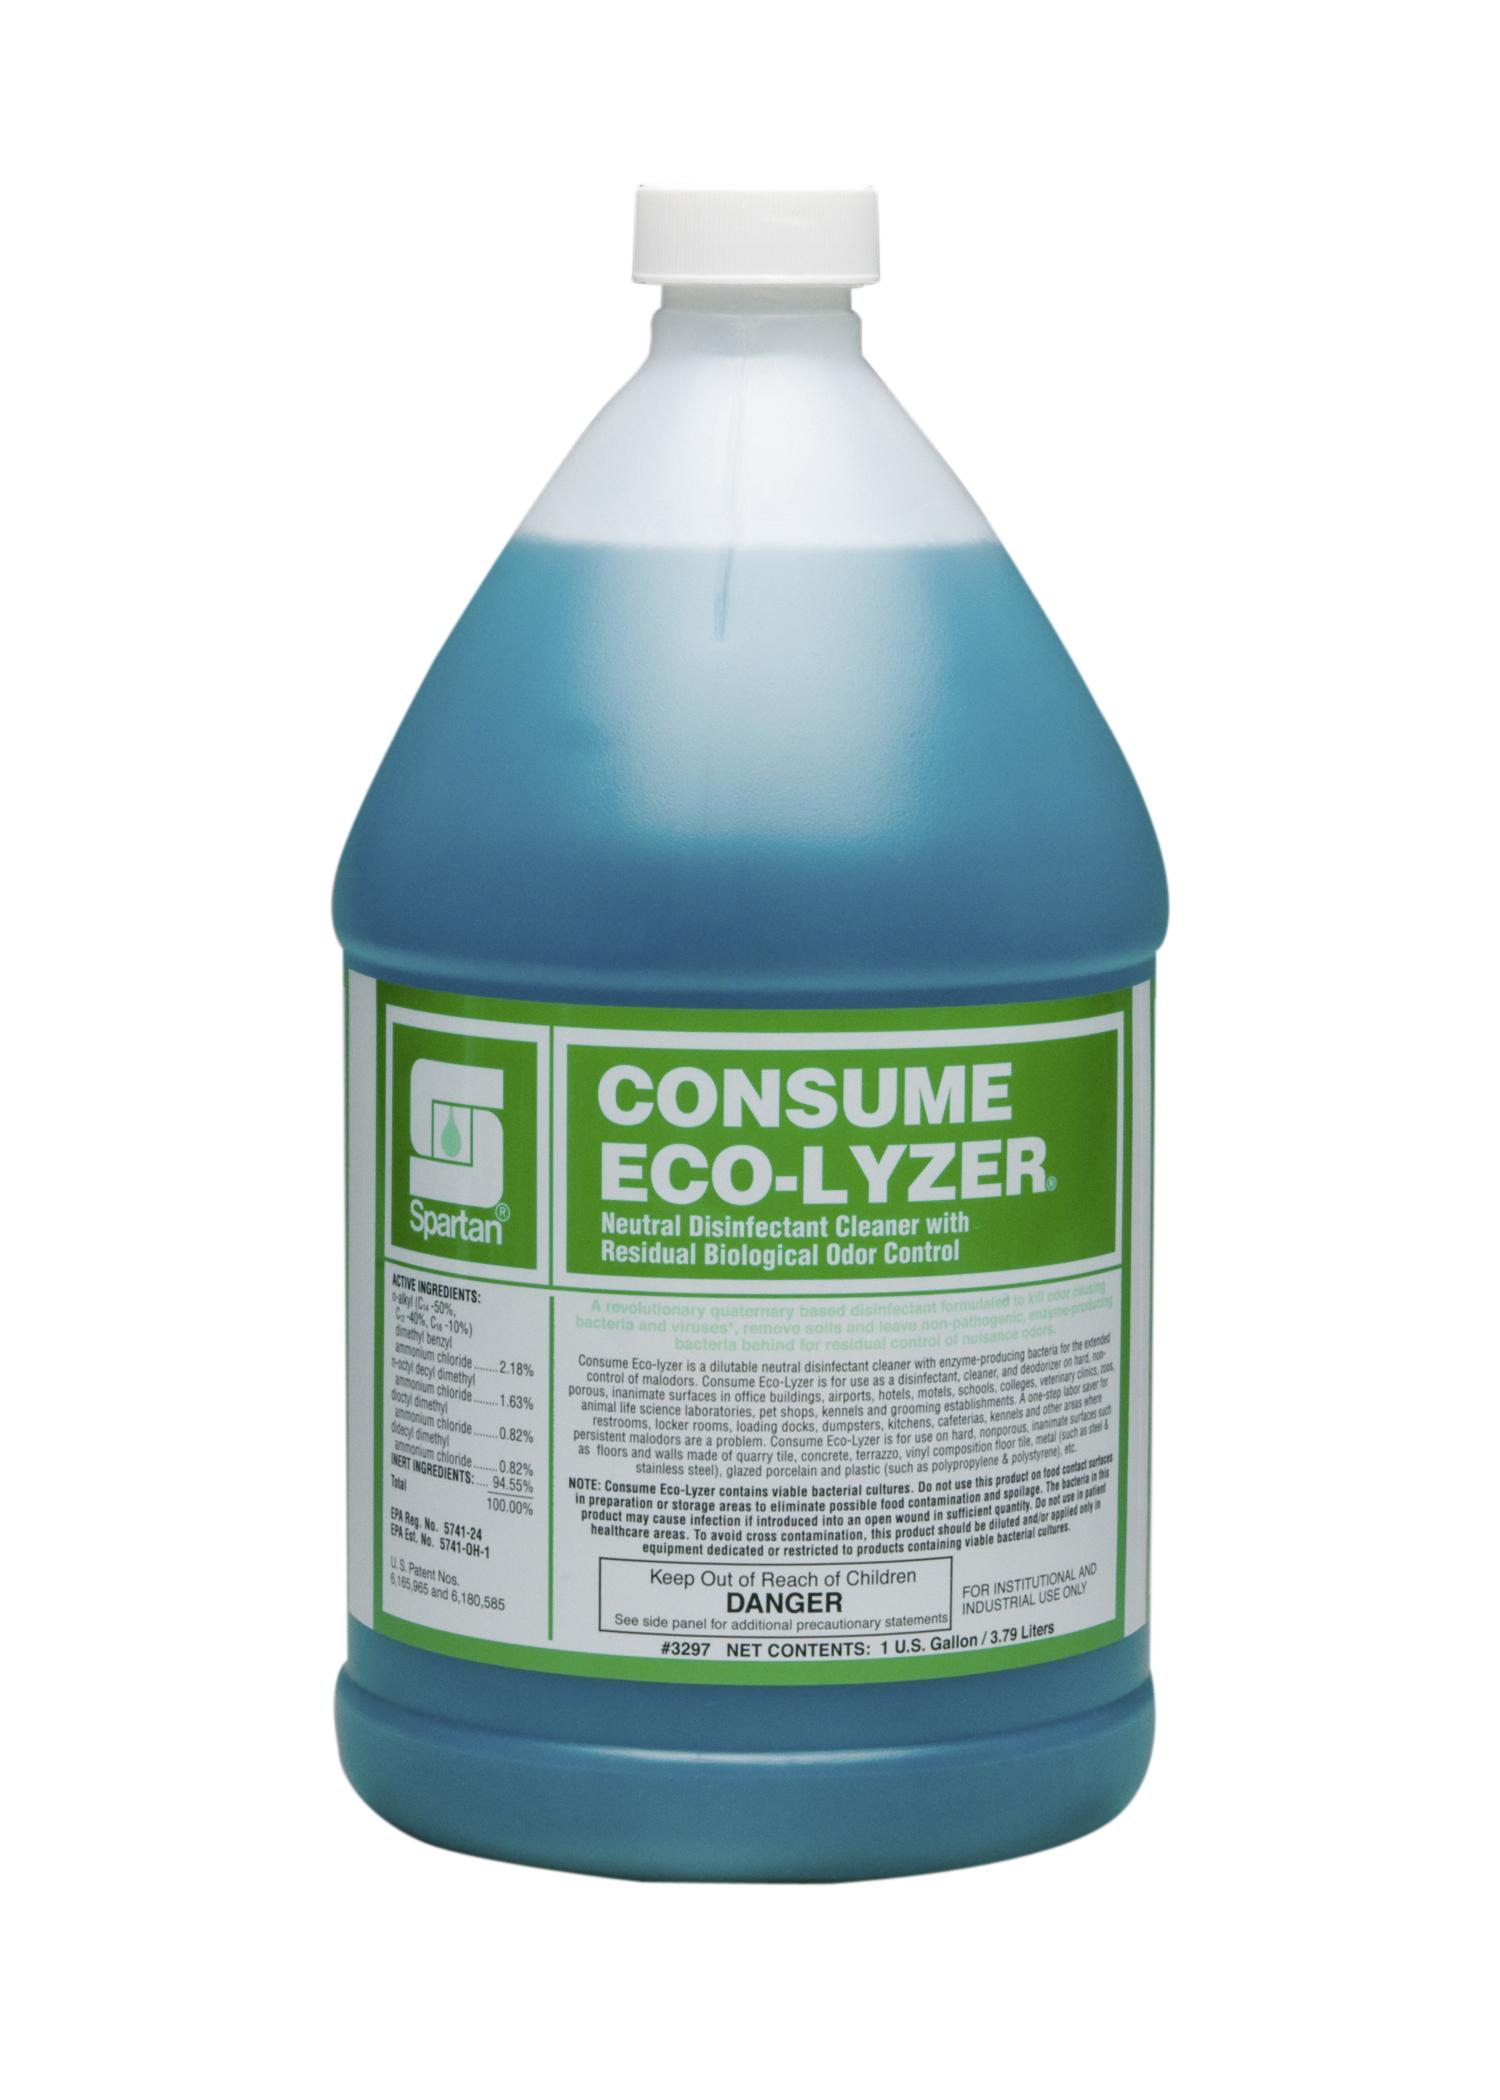 3297-04 CONSUME ECO-LYZER|GAL